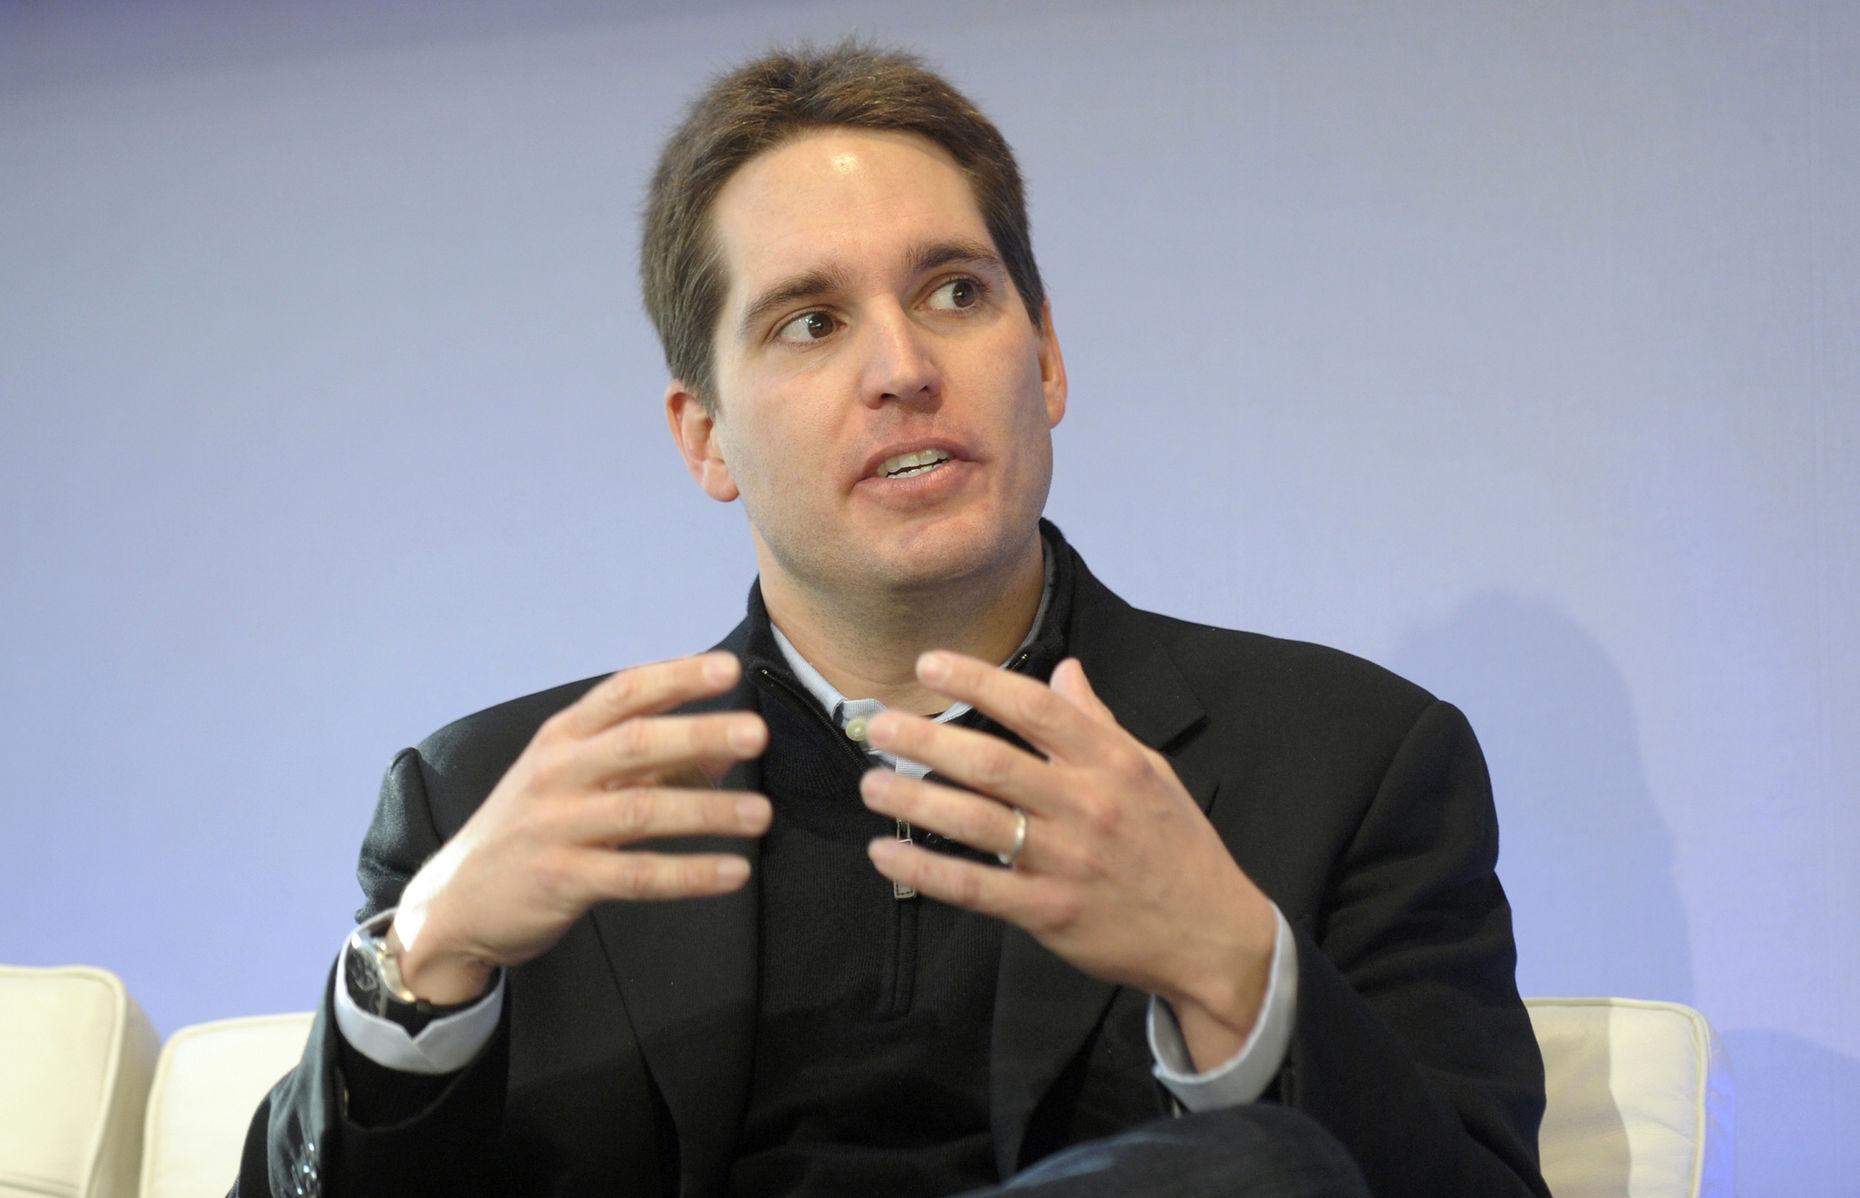 Vessel co-founder Jason Kilar. Photo by Bloomberg.